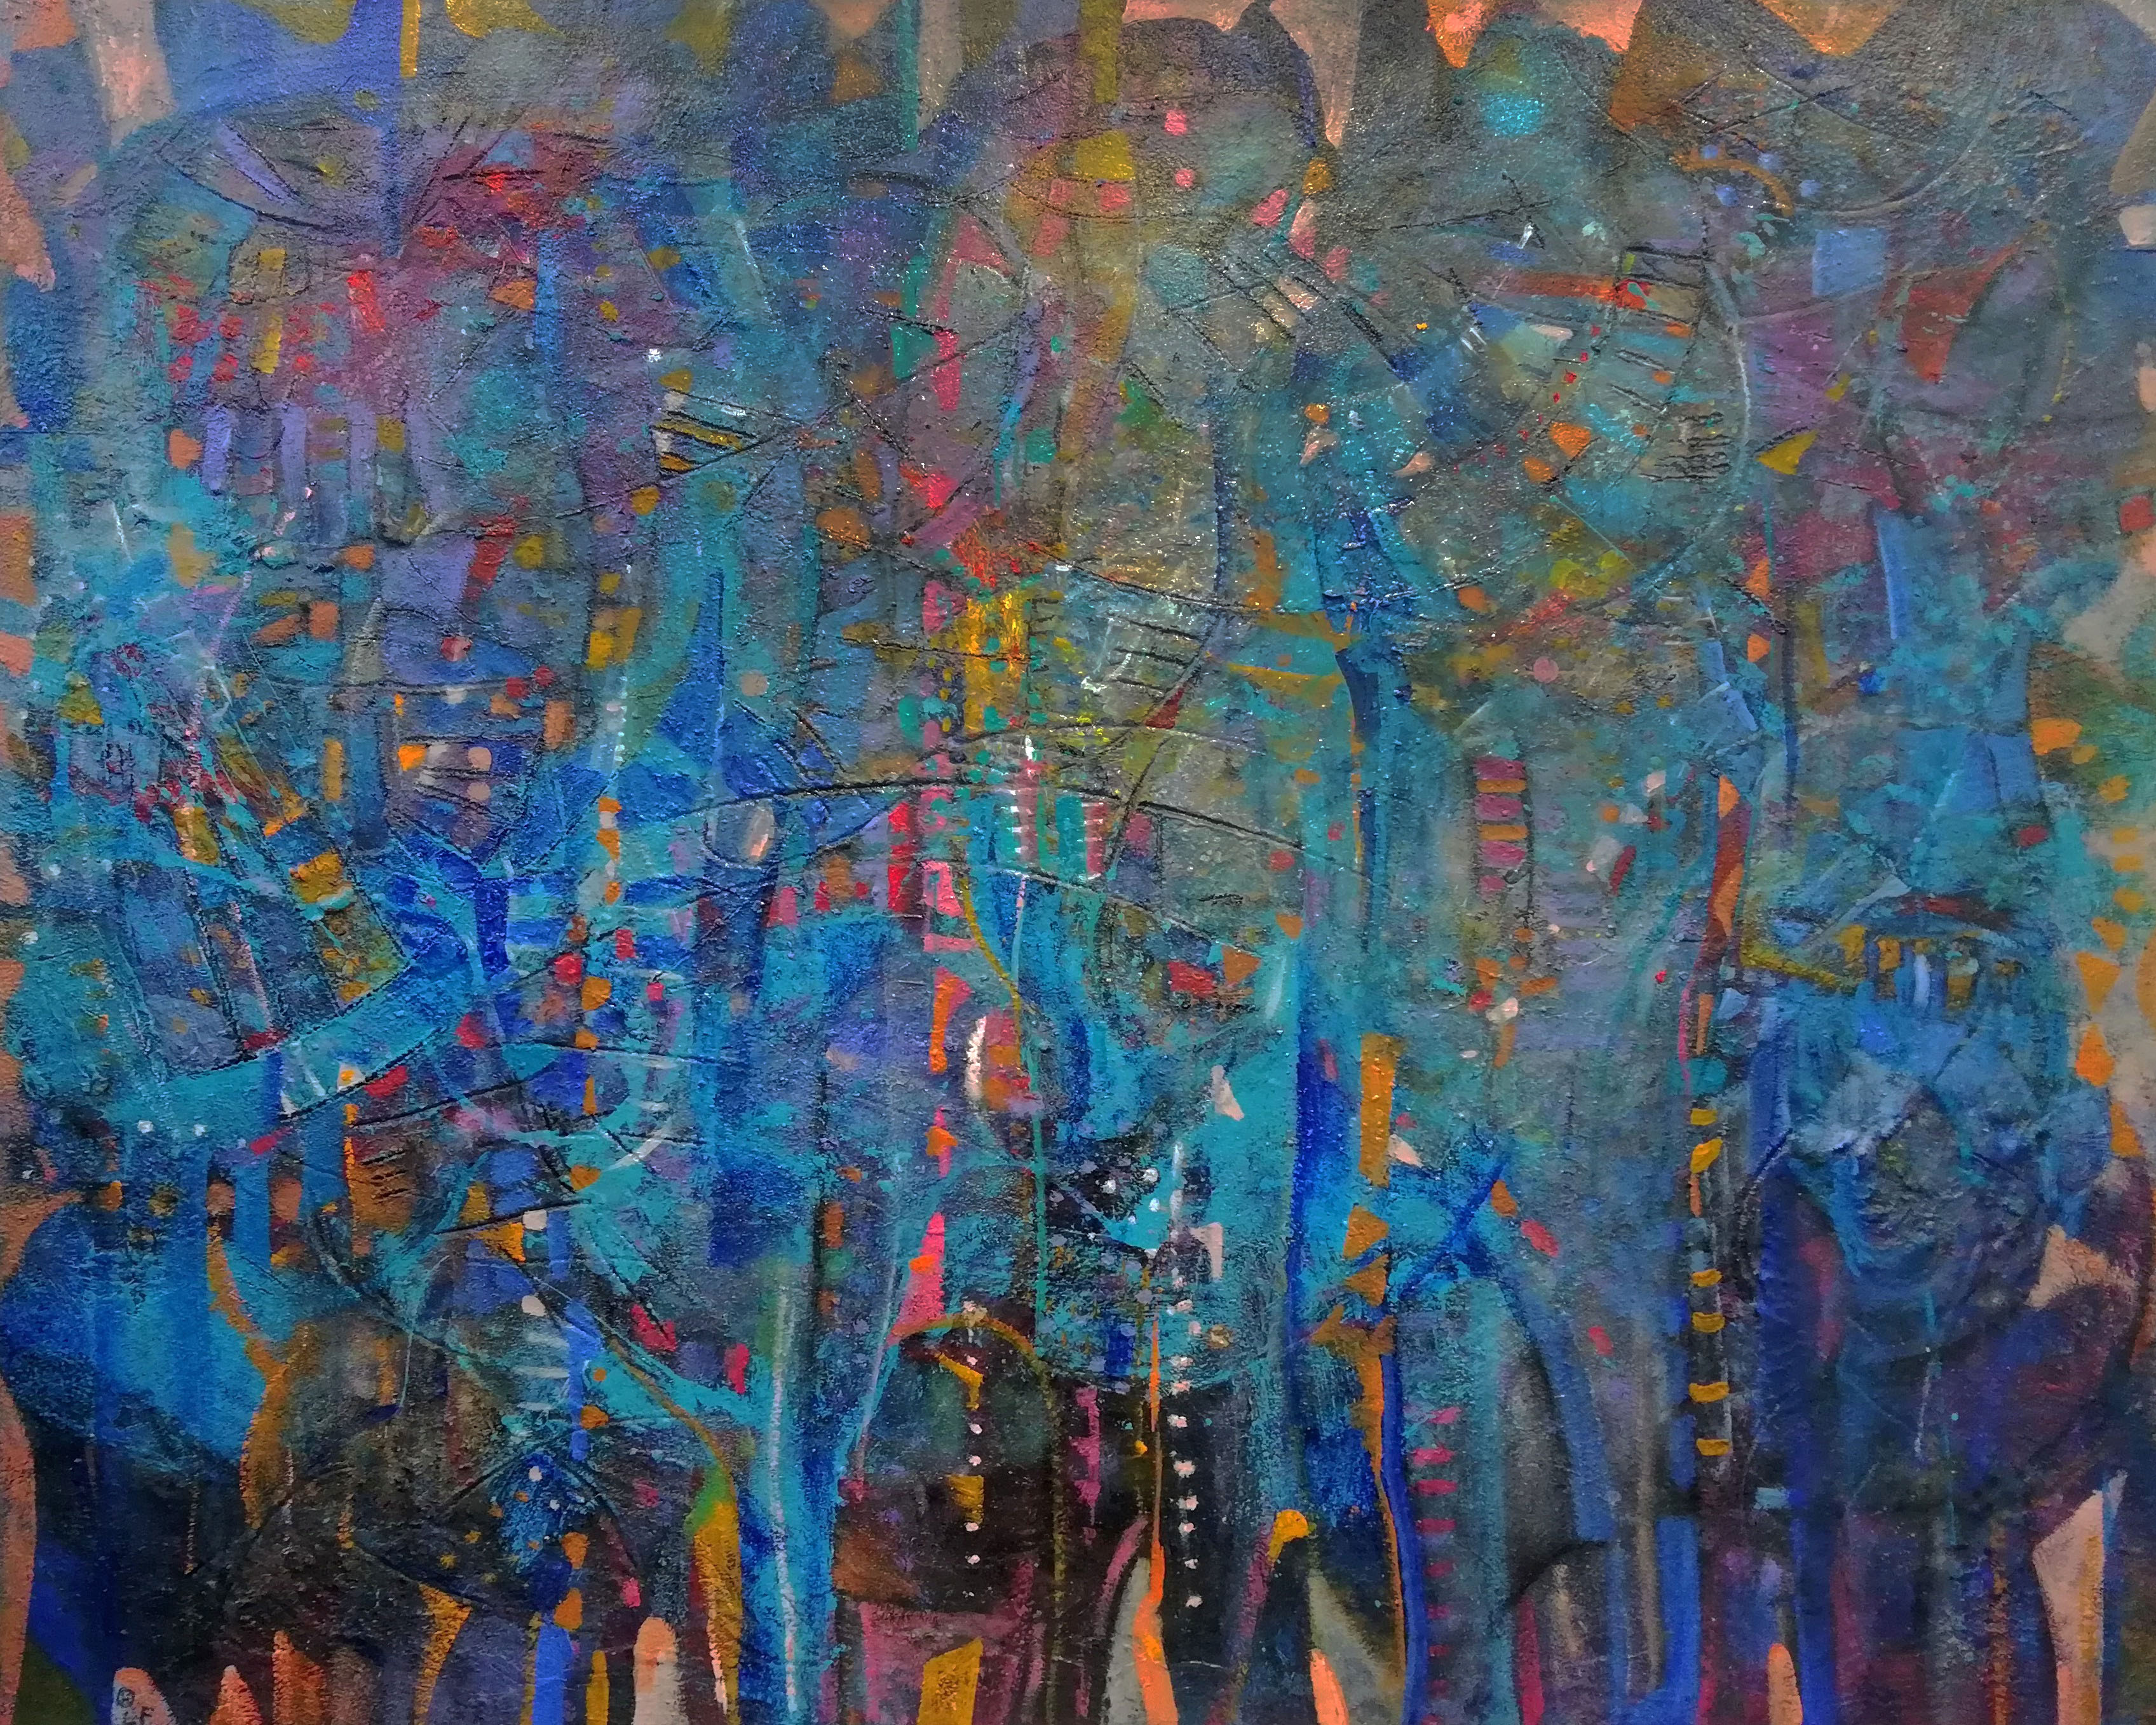 El bosque será azul óleo s/tela 120 x 150 cms / 47 x 59 inches